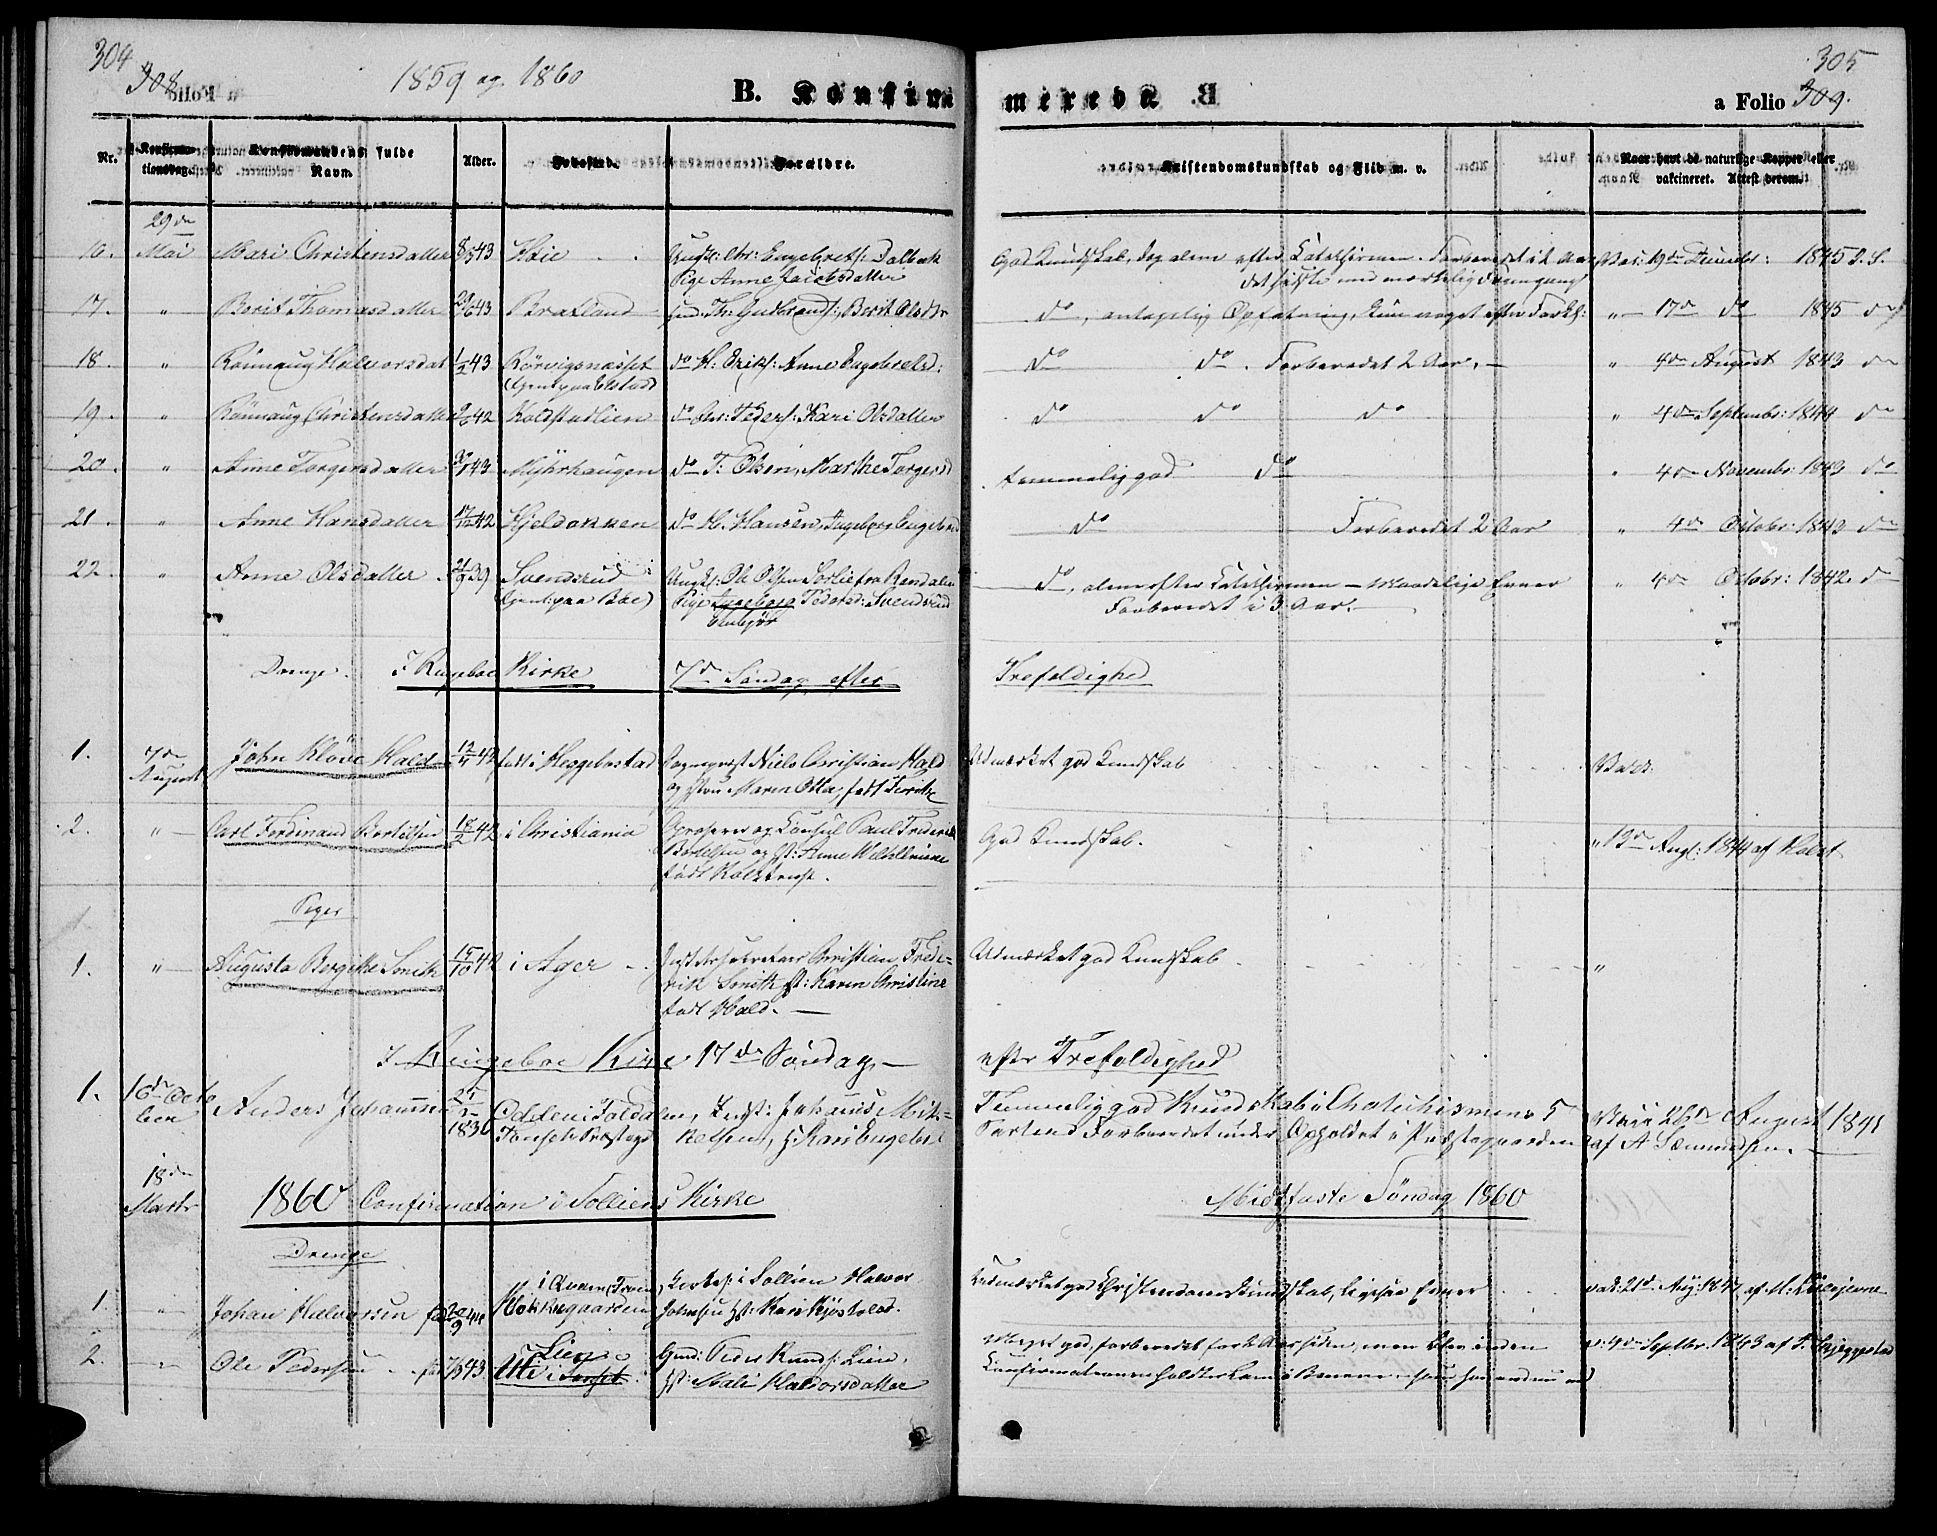 SAH, Ringebu prestekontor, Klokkerbok nr. 3, 1854-1866, s. 304-305